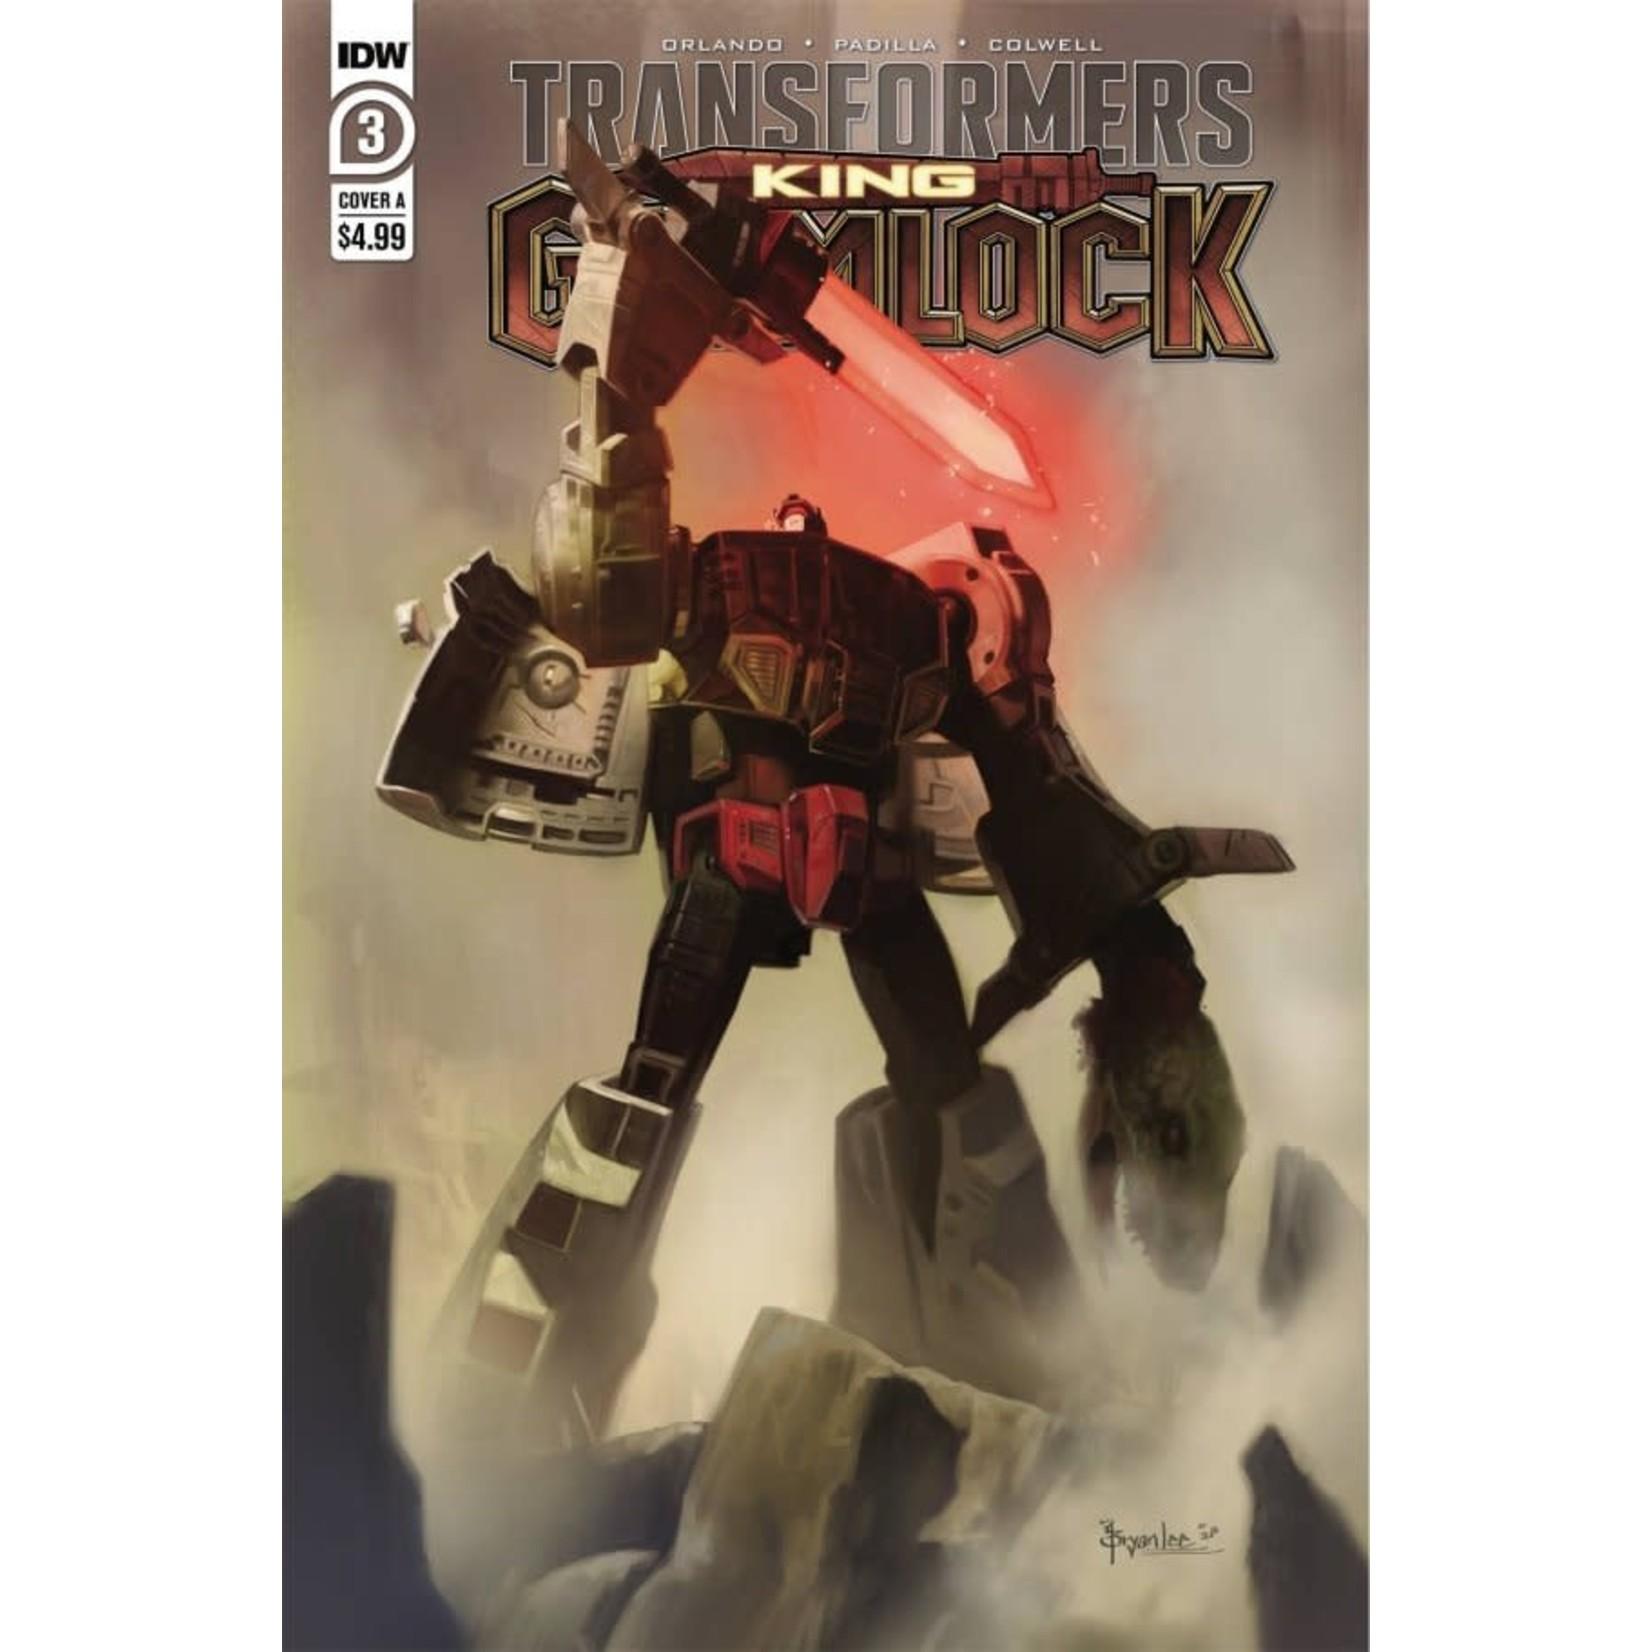 Transformers: King Grimlock #3